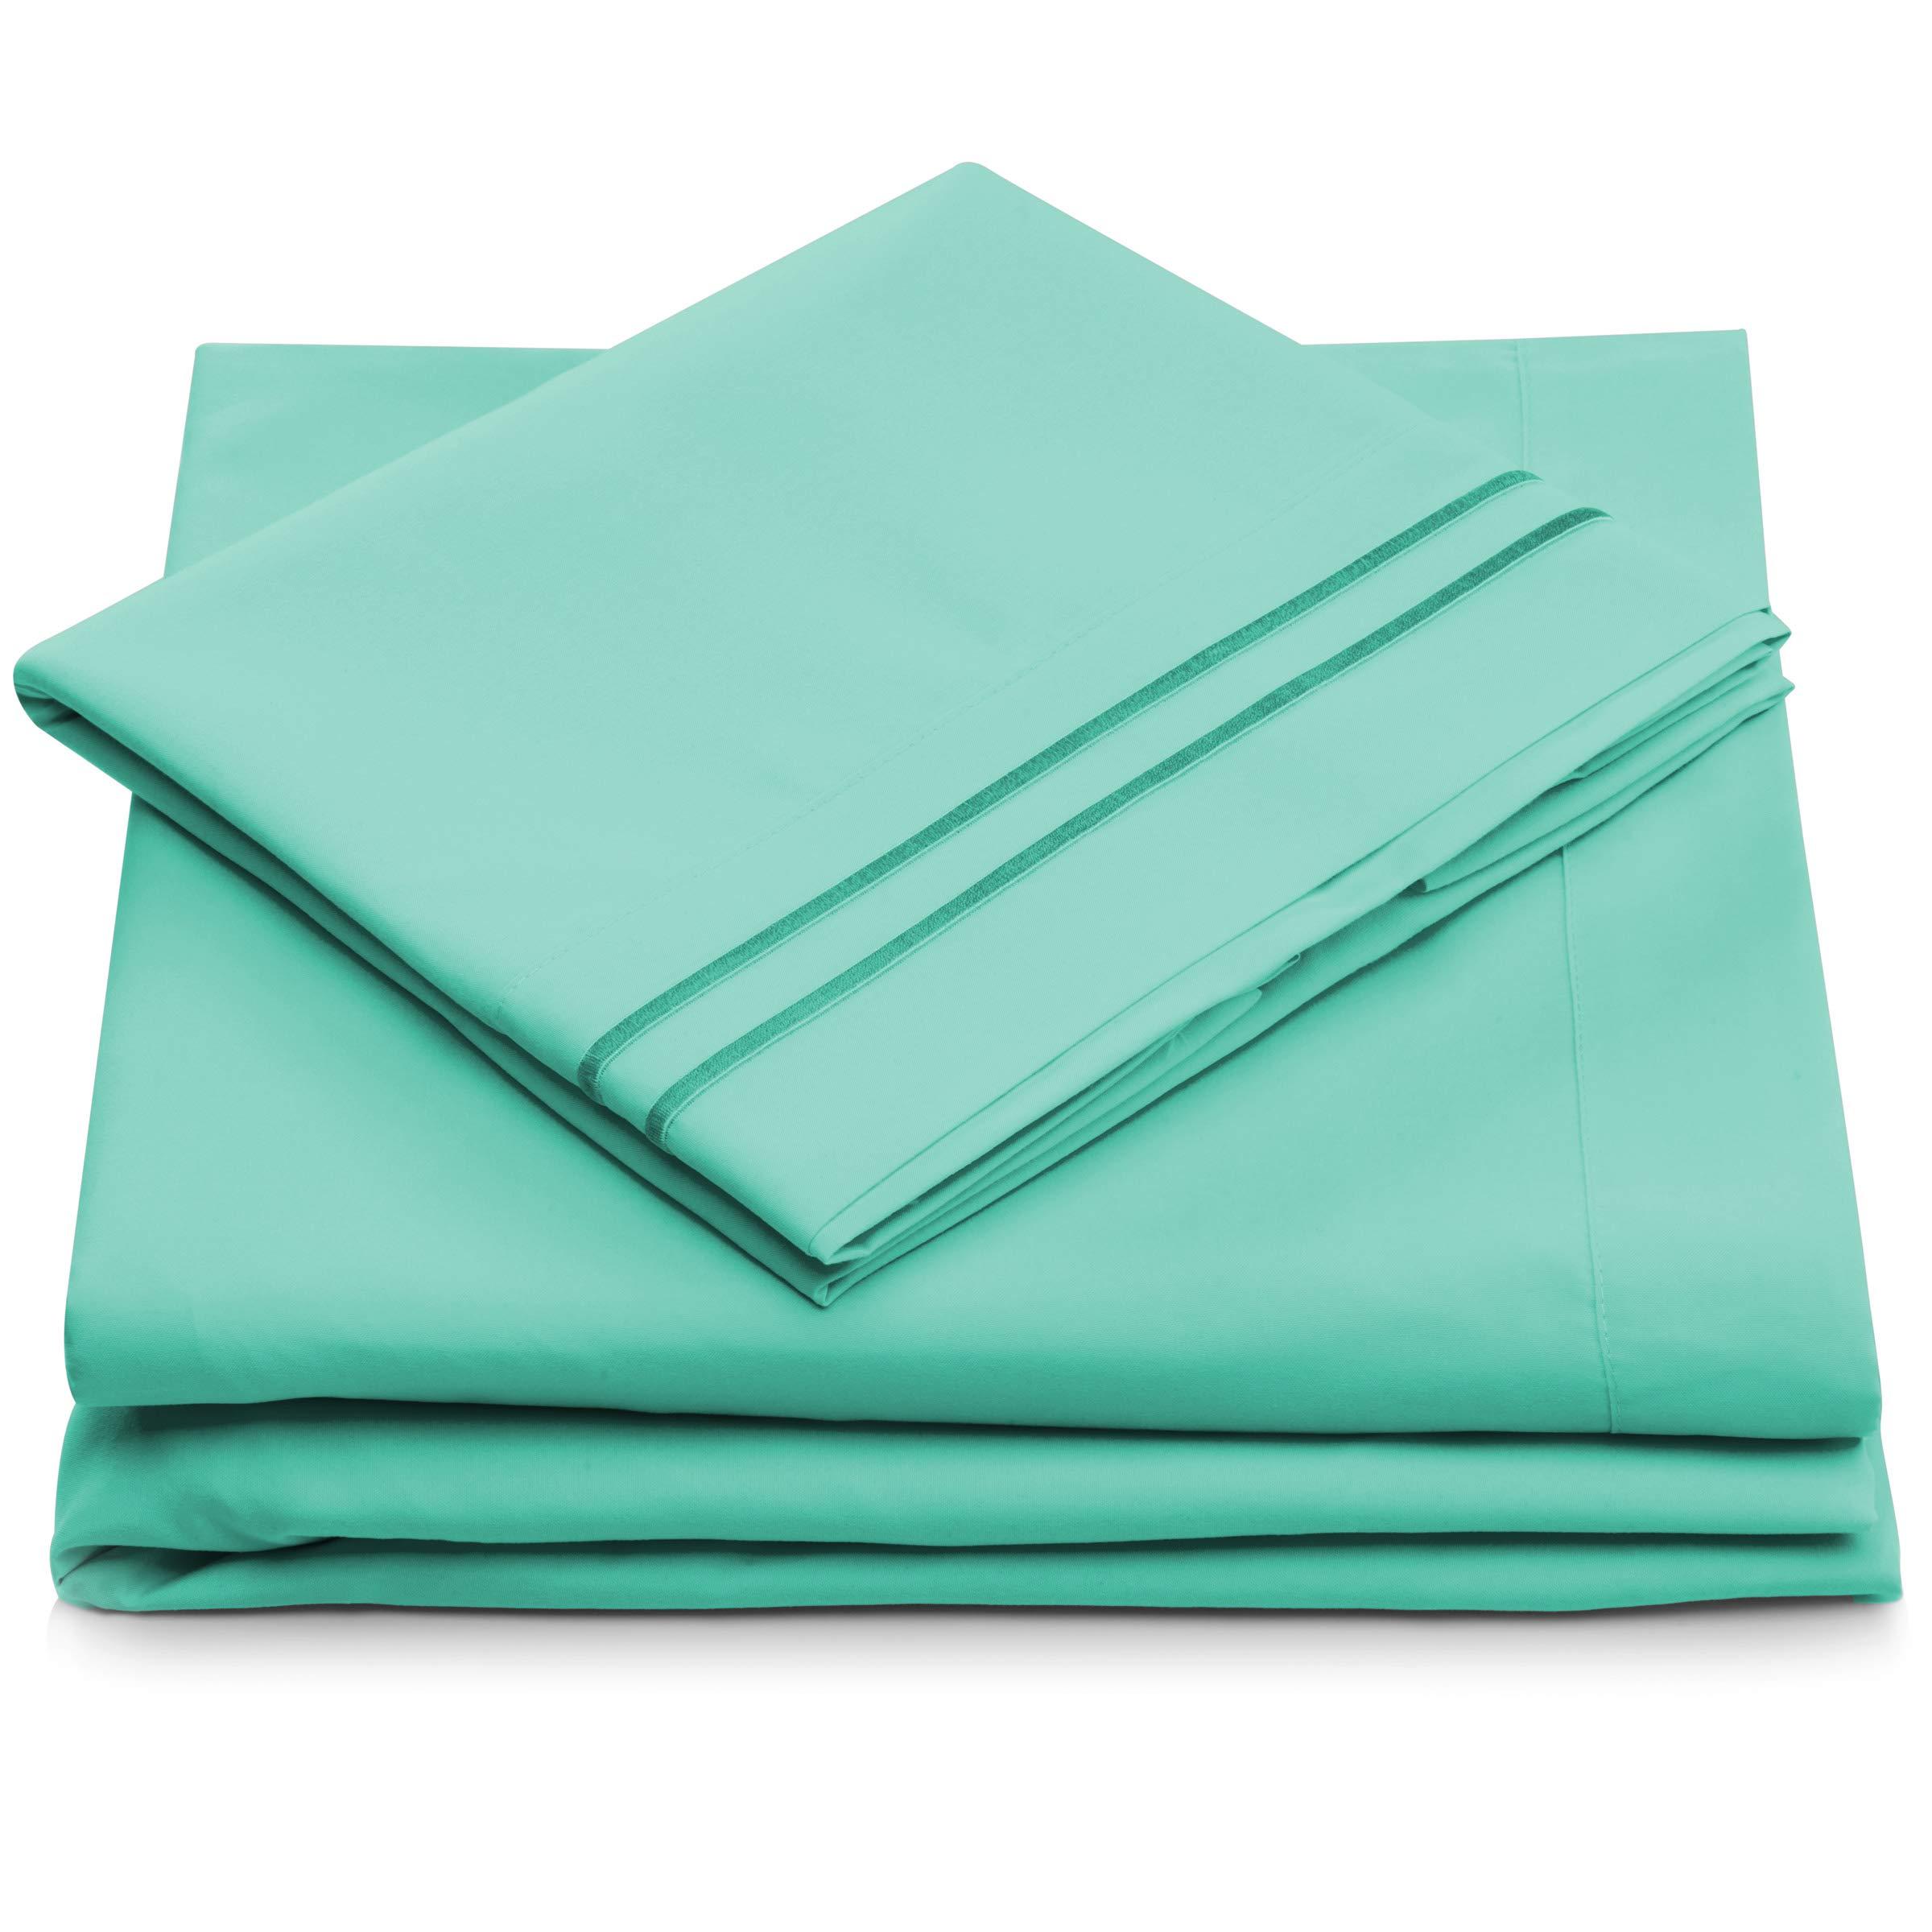 King Size Sheet Set - Pastel Green King Bed Sheets - Deep Pocket - Super Soft Hotel Bedding - Hypoallergenic - Cool & Wrinkle Resistant - Mint Green Bedsheets - 4 Piece (King, Pastel Green)